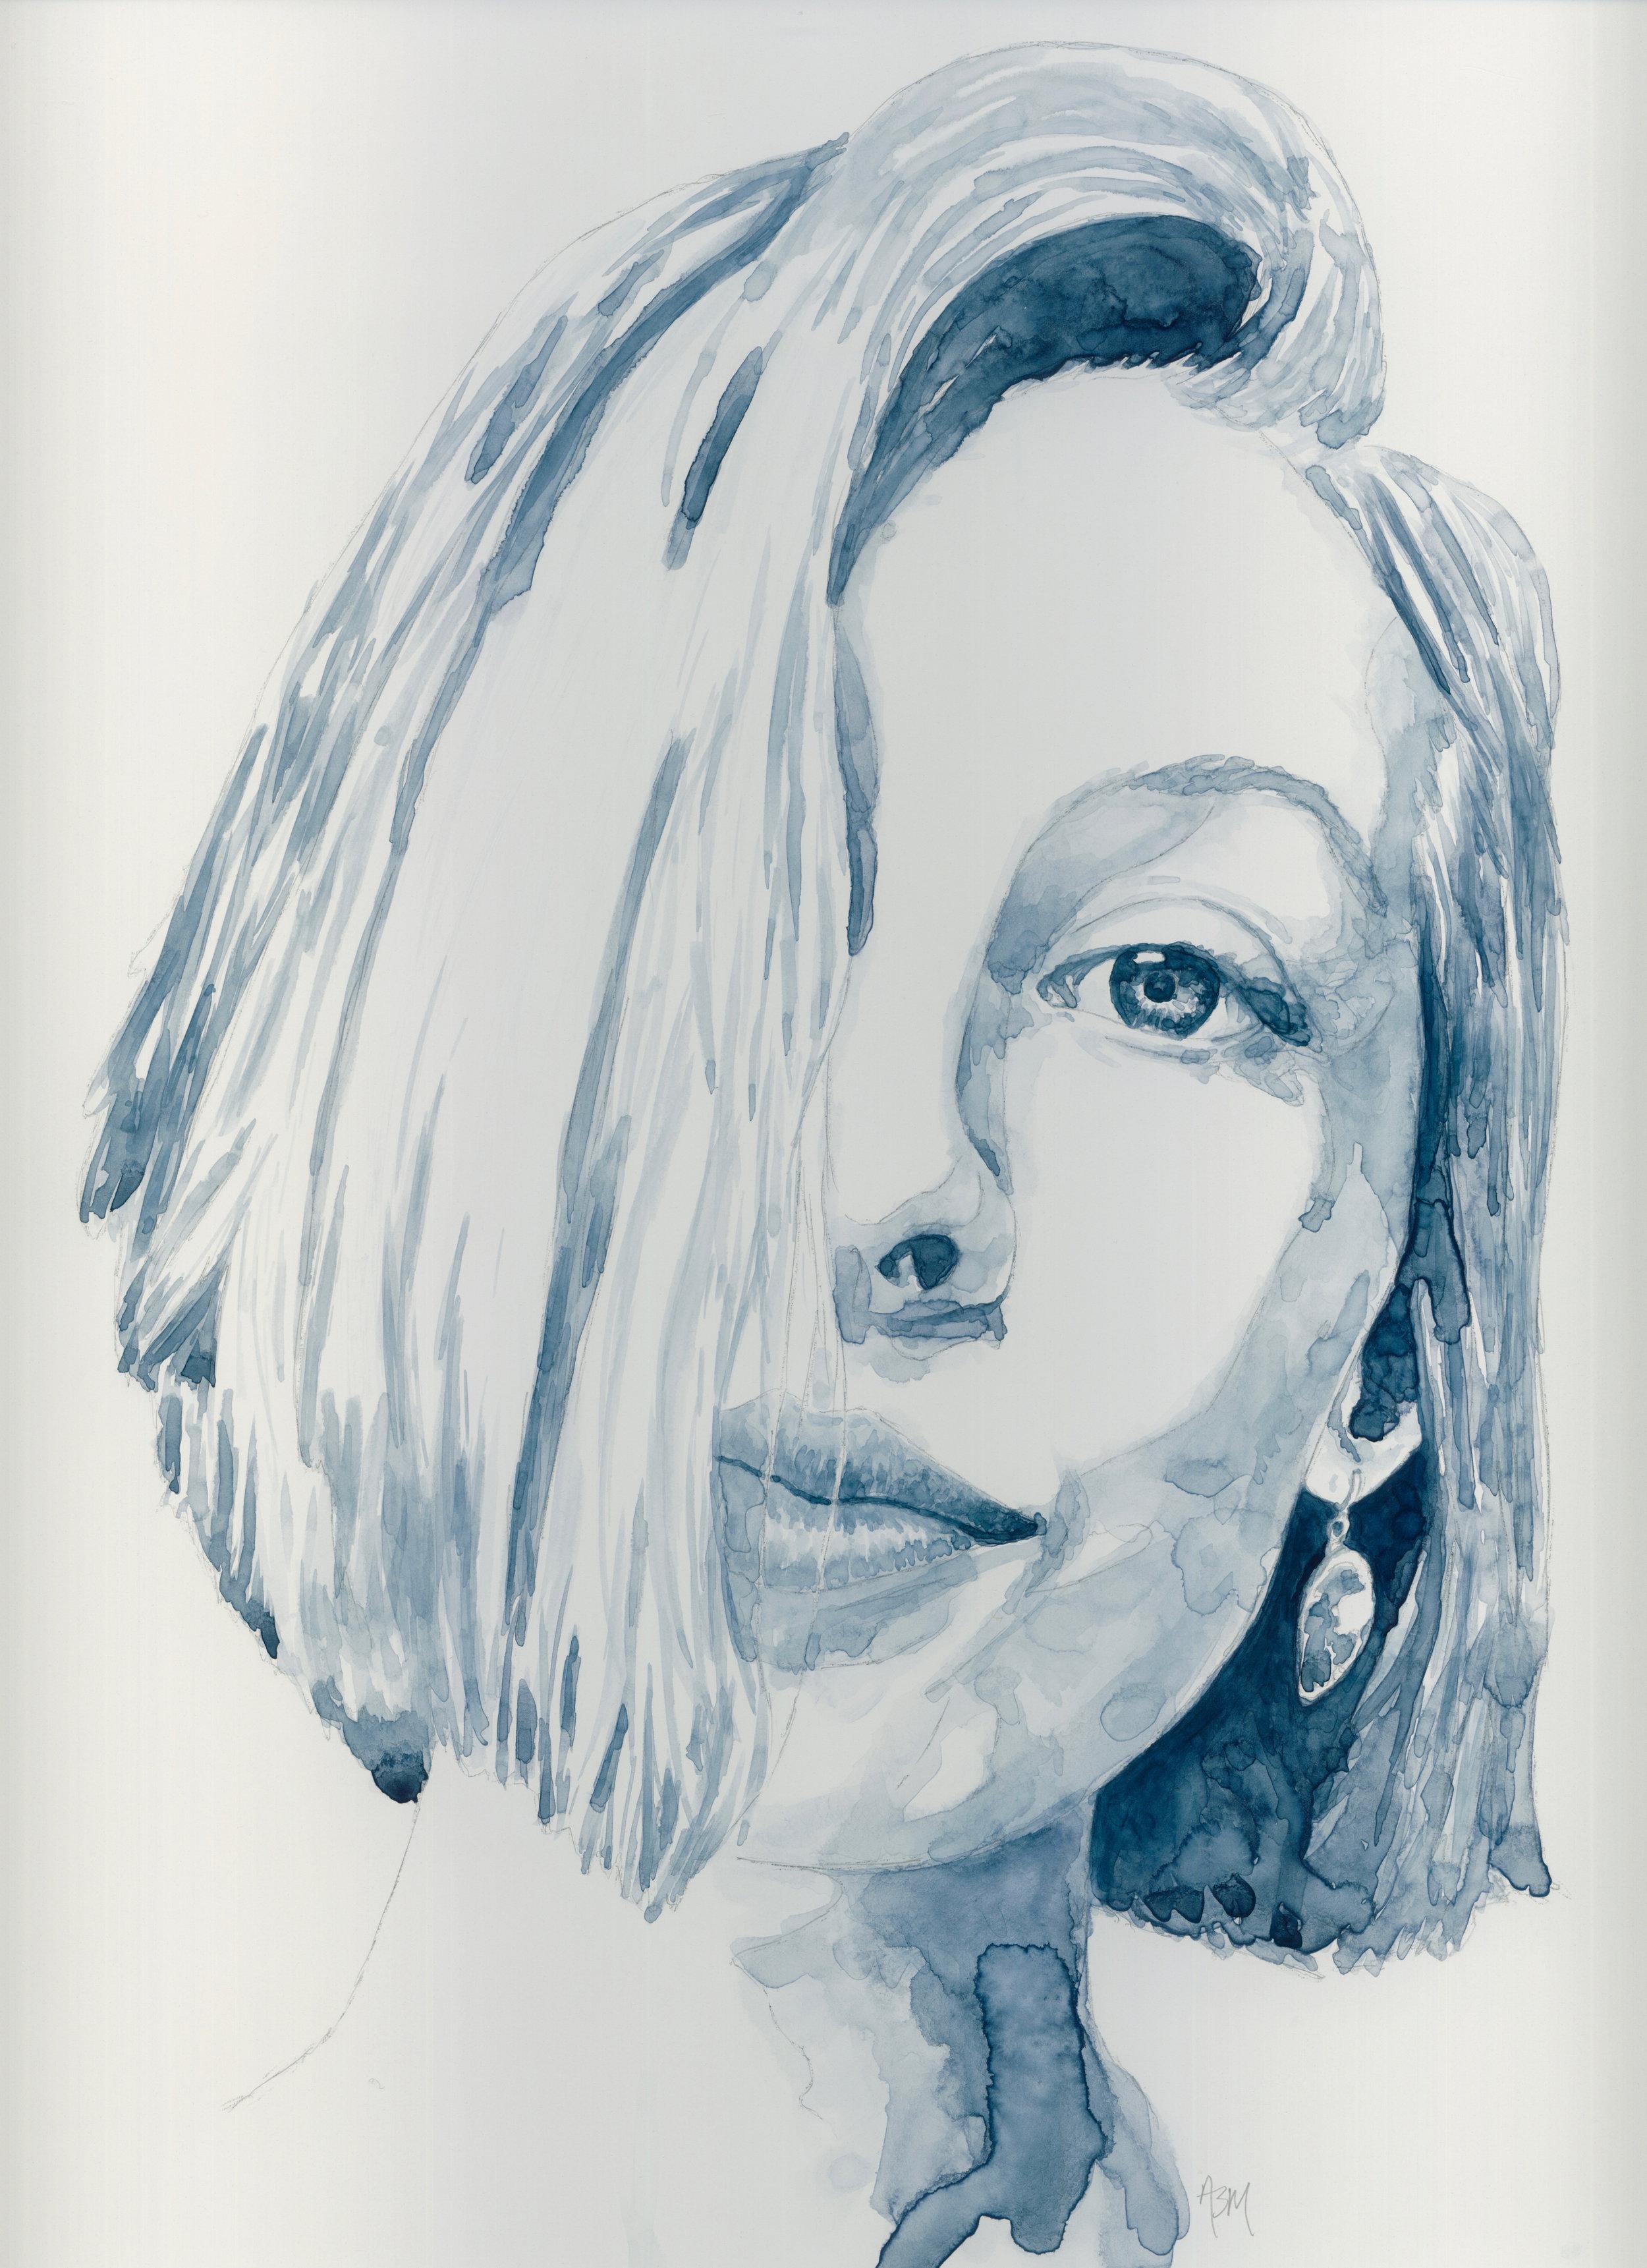 Alicia - Watercolor on Clayboard